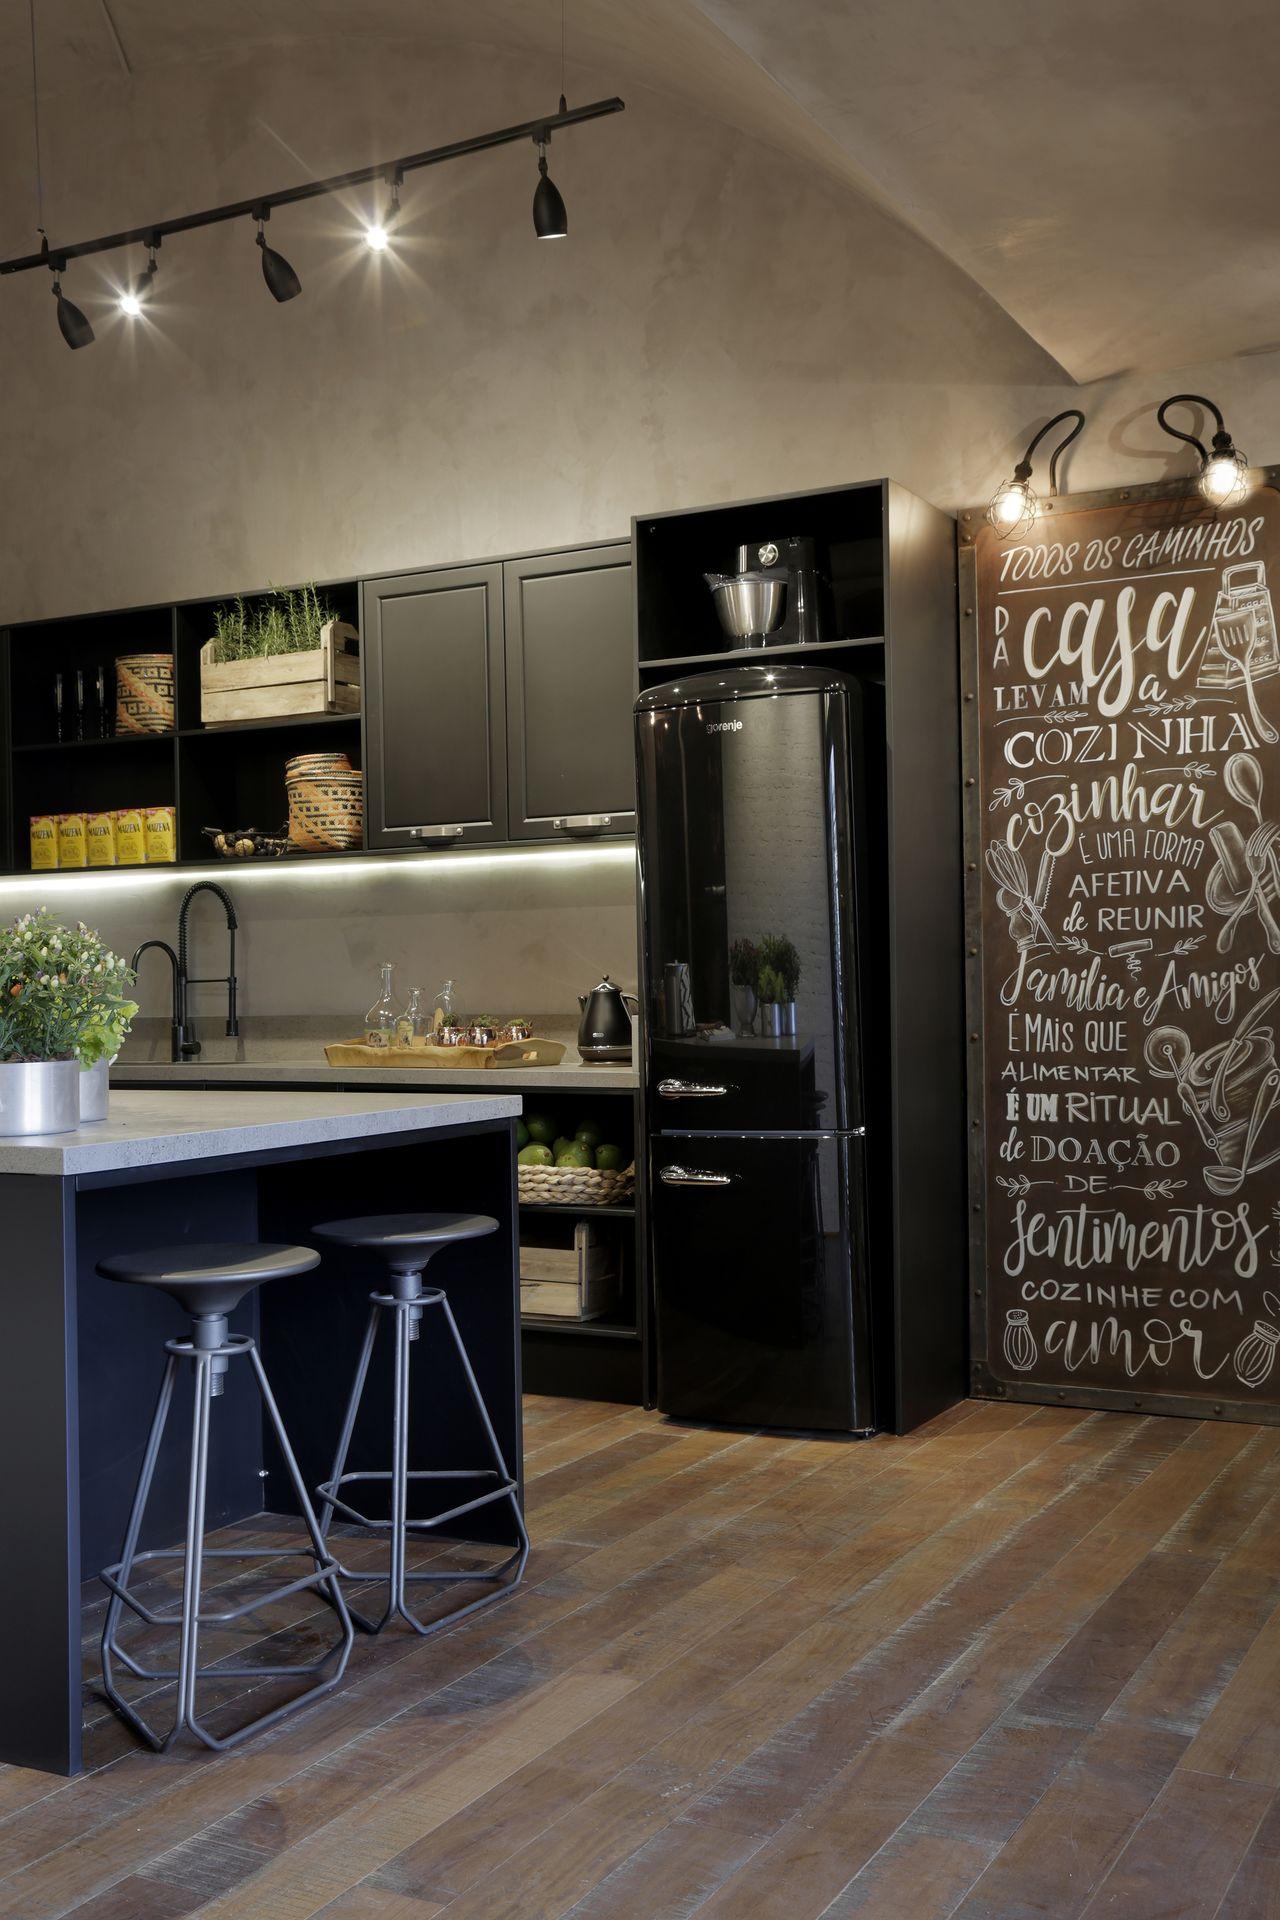 Cozinha Estilo Industrial E Painel De Quadro Negro De Rica Salguero